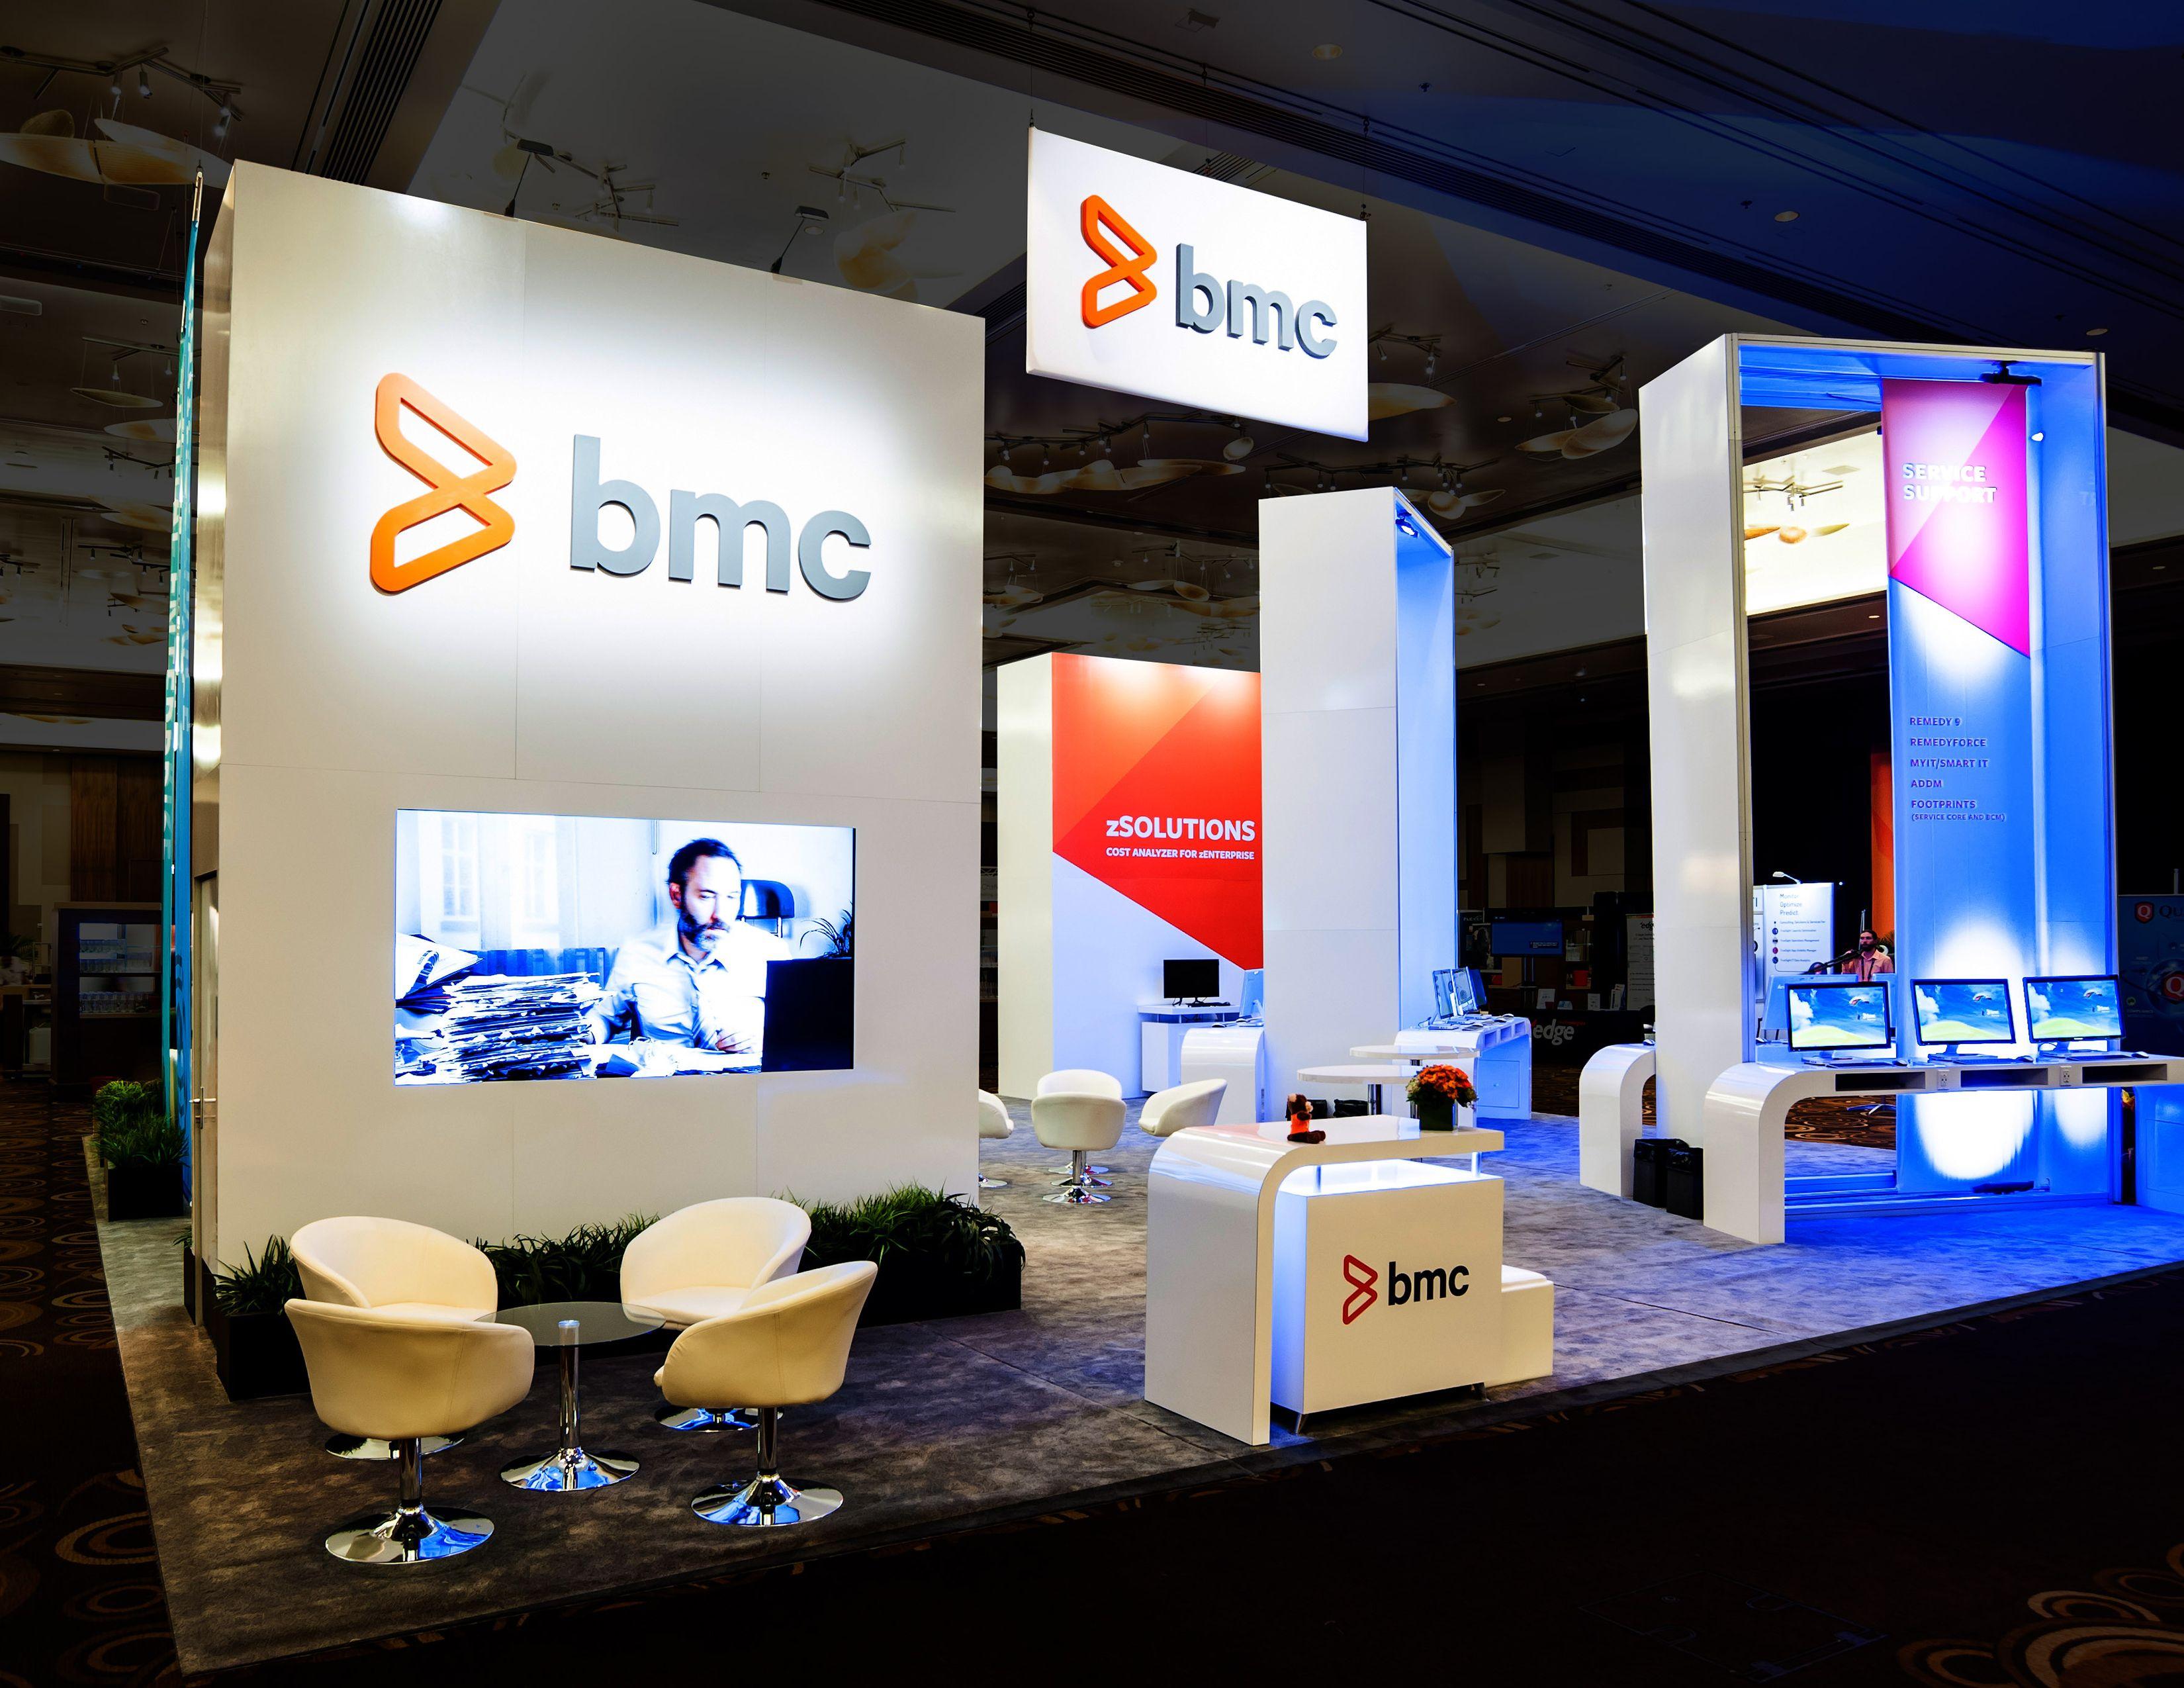 Exhibitor Bmc Software Inc System Octanorm Usa Design 2020 Exhibits Inc